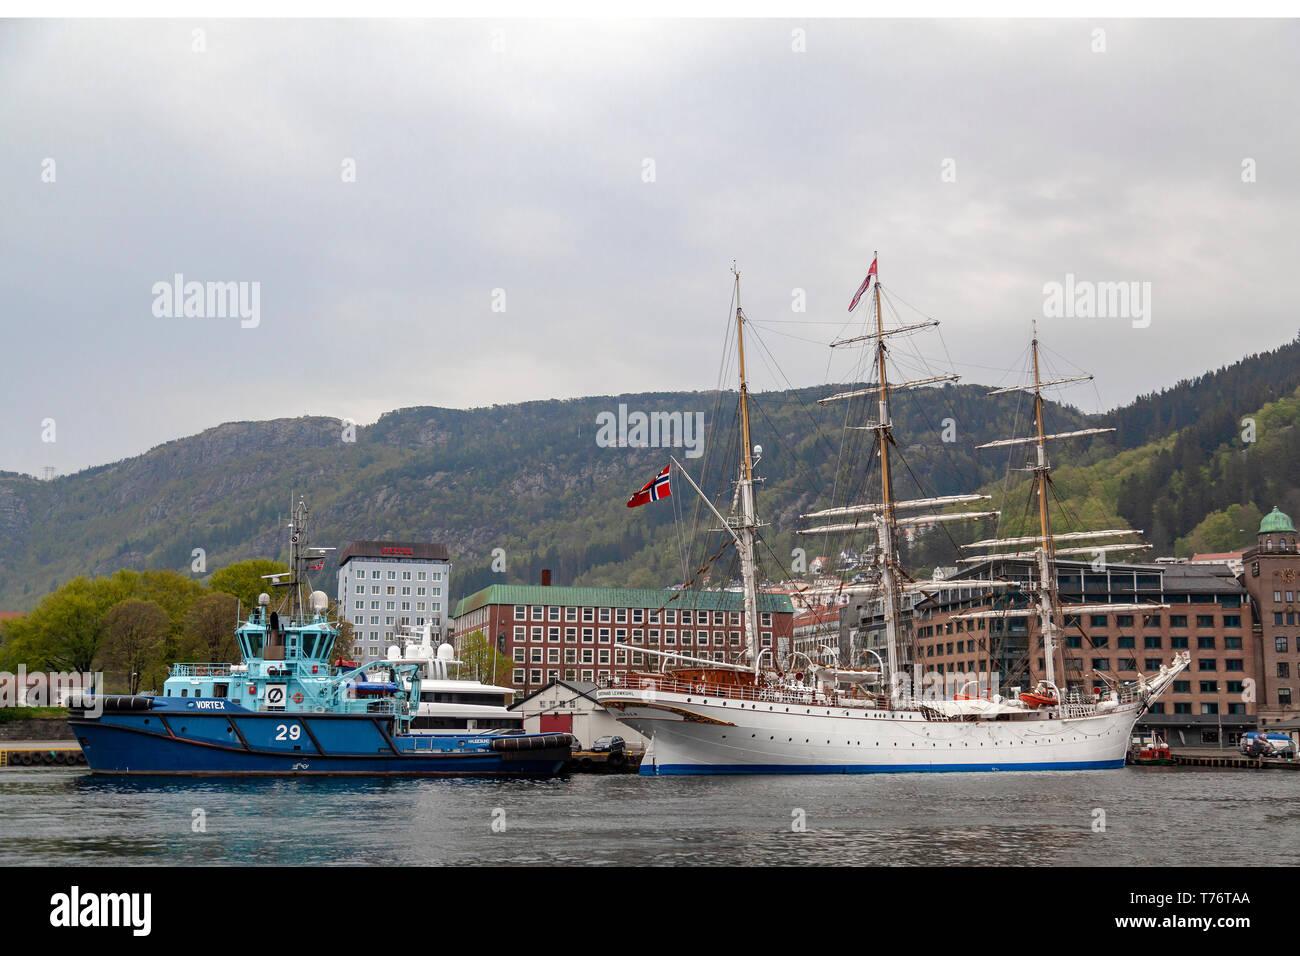 Tug boat Vortex at Bradbenken terminal in the port of Bergen, Norway.  Tall ship, sailship Statsraad Lehmkuhl. - Stock Image